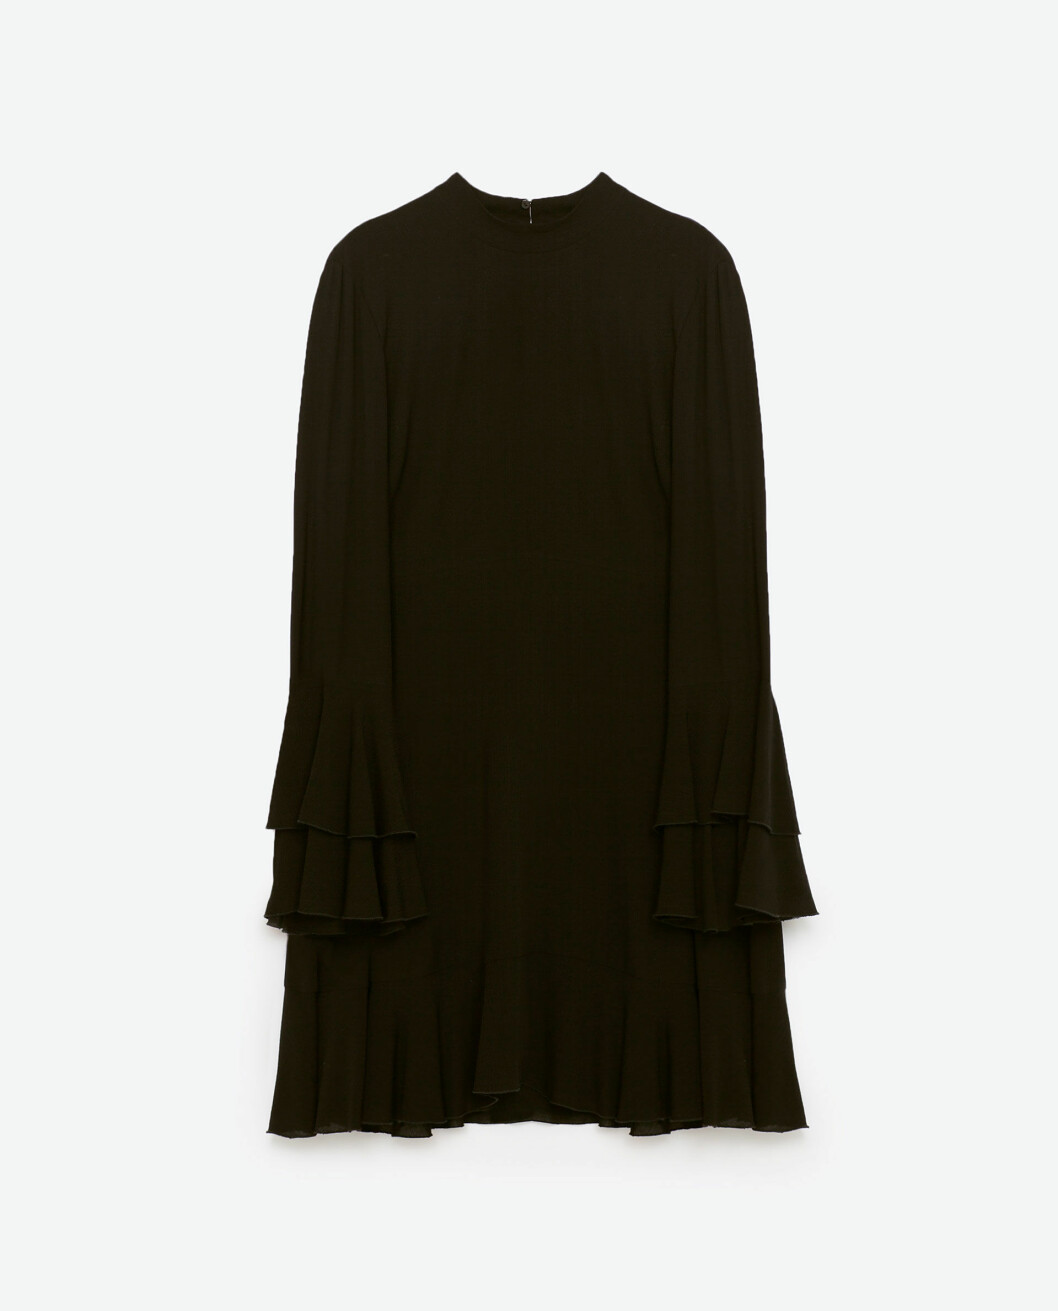 klänning-volanger-zara